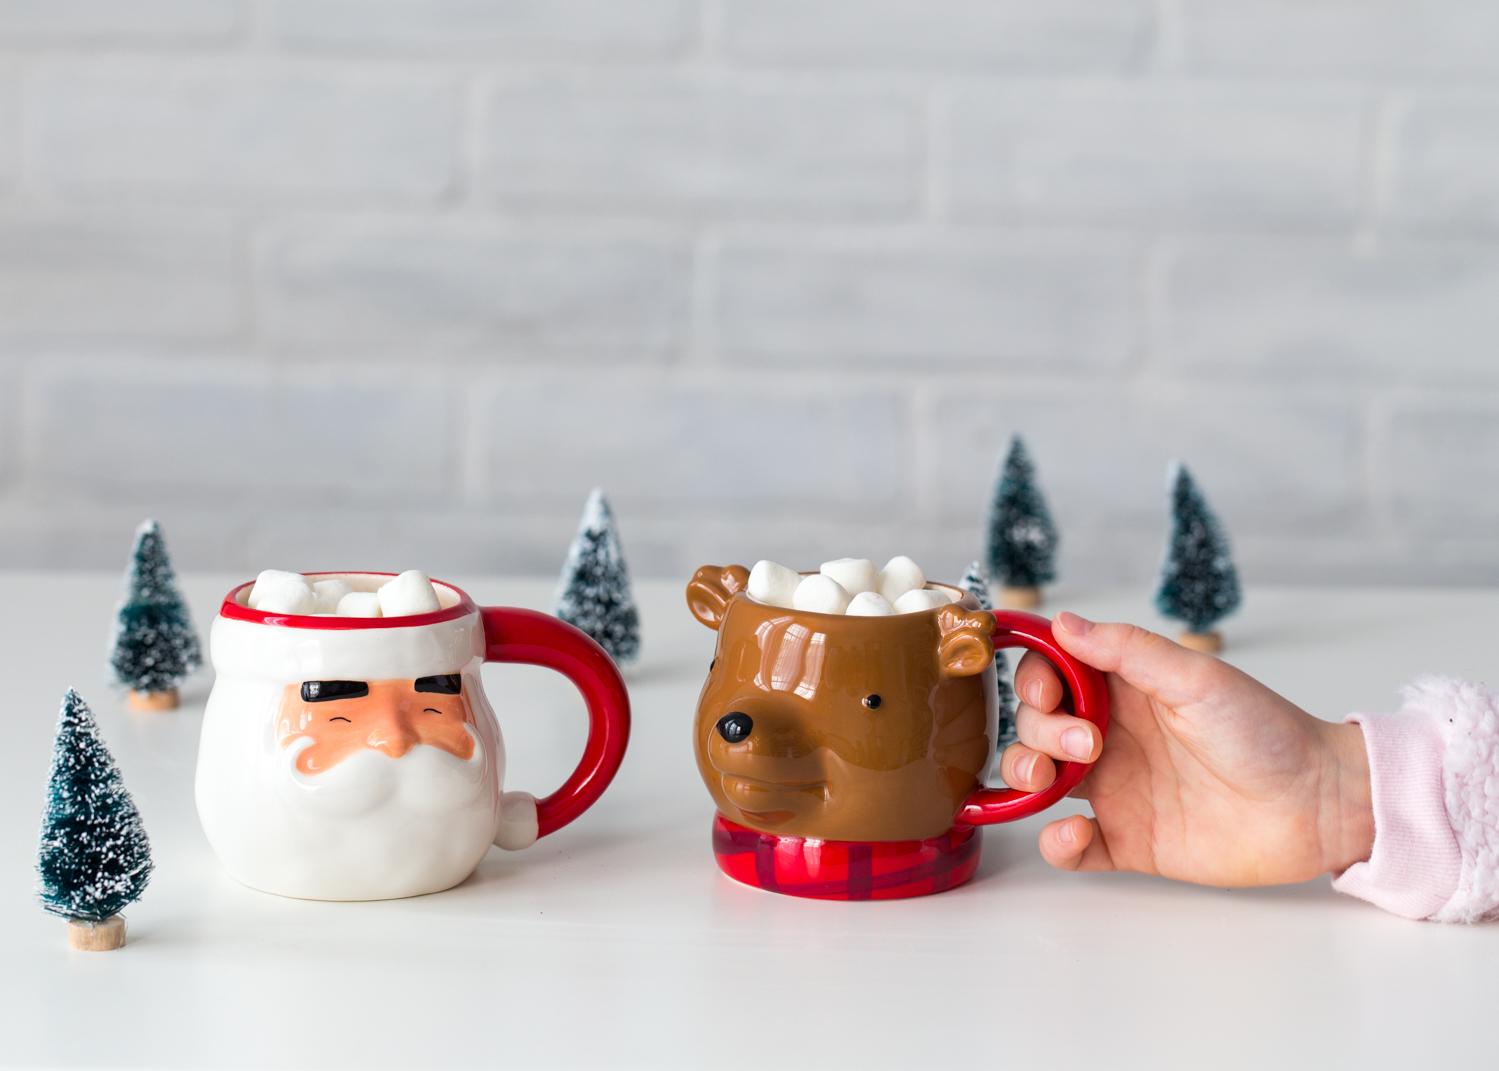 Hot Chocolate in Christmas Mugs